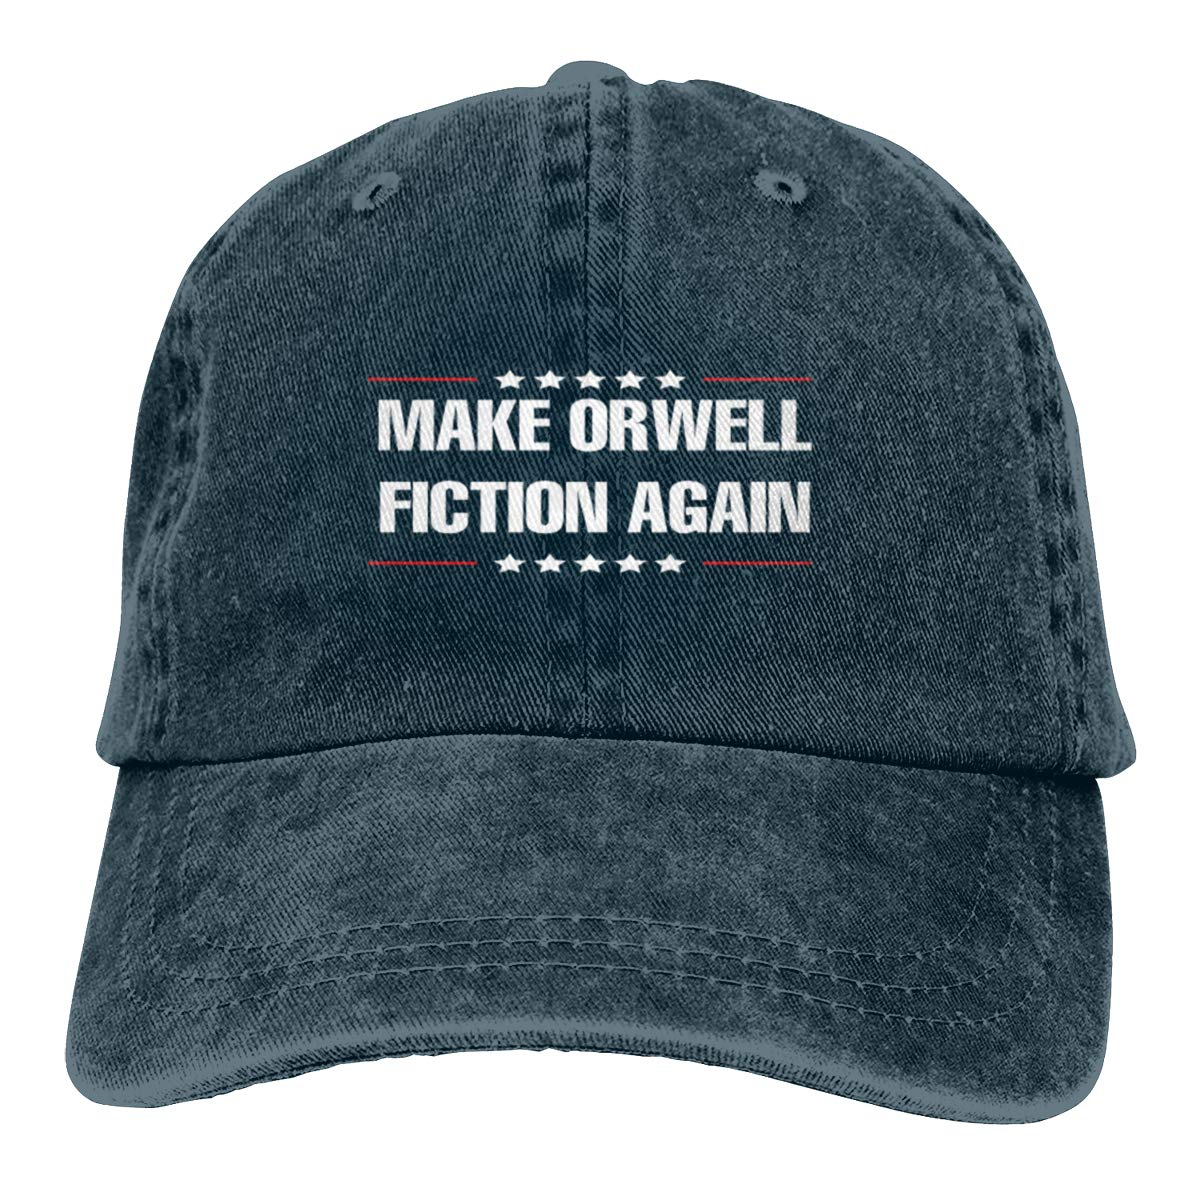 Make Orwell Fiction Again Washed Denim Hat Adjustable Unisex Dad Baseball Caps